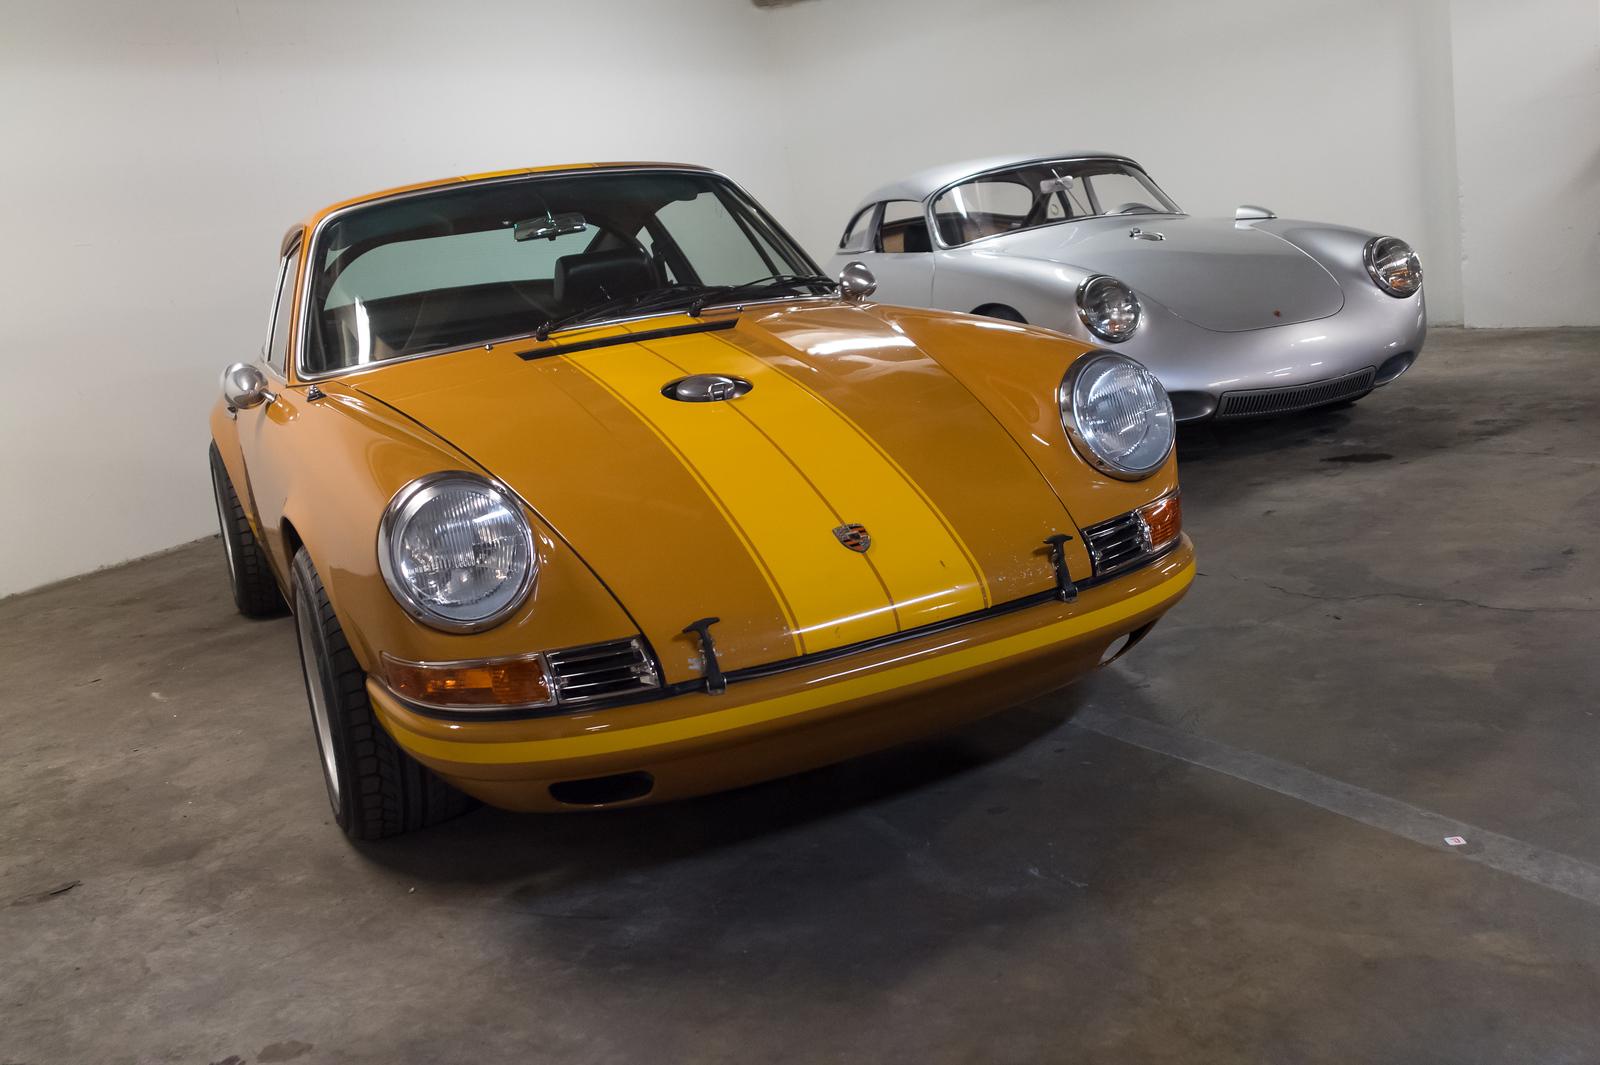 "[L-R] 911 Singer, 1964 Porsche 356 ""Emory Special"""